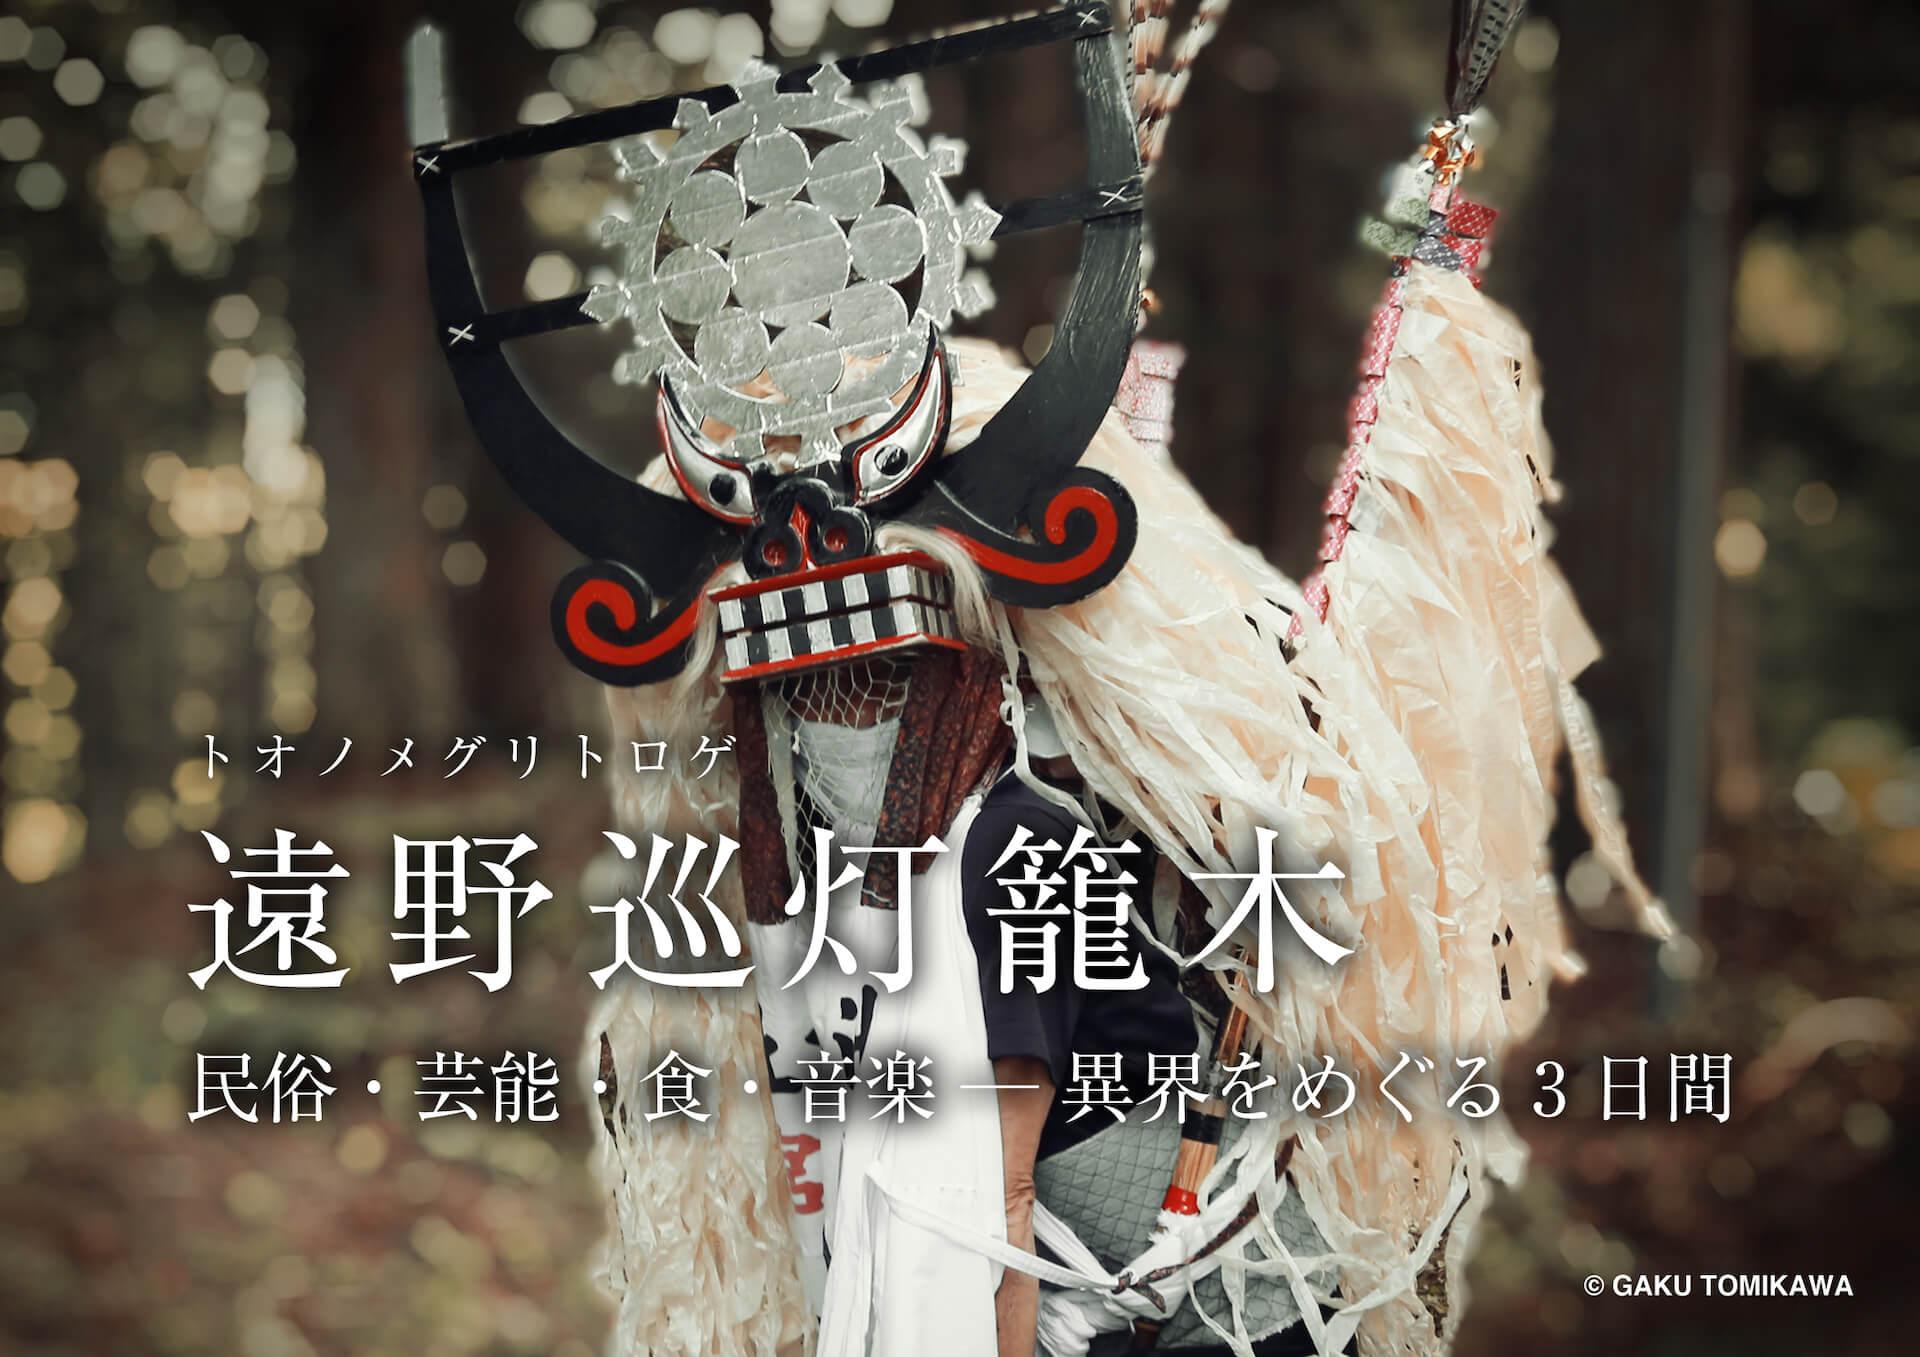 OLAibi+KOM_I、Kuniyuki Takashiらが出演するカルチャーツアー<遠野メグリトロゲ>が開催決定! culture210701_touno1